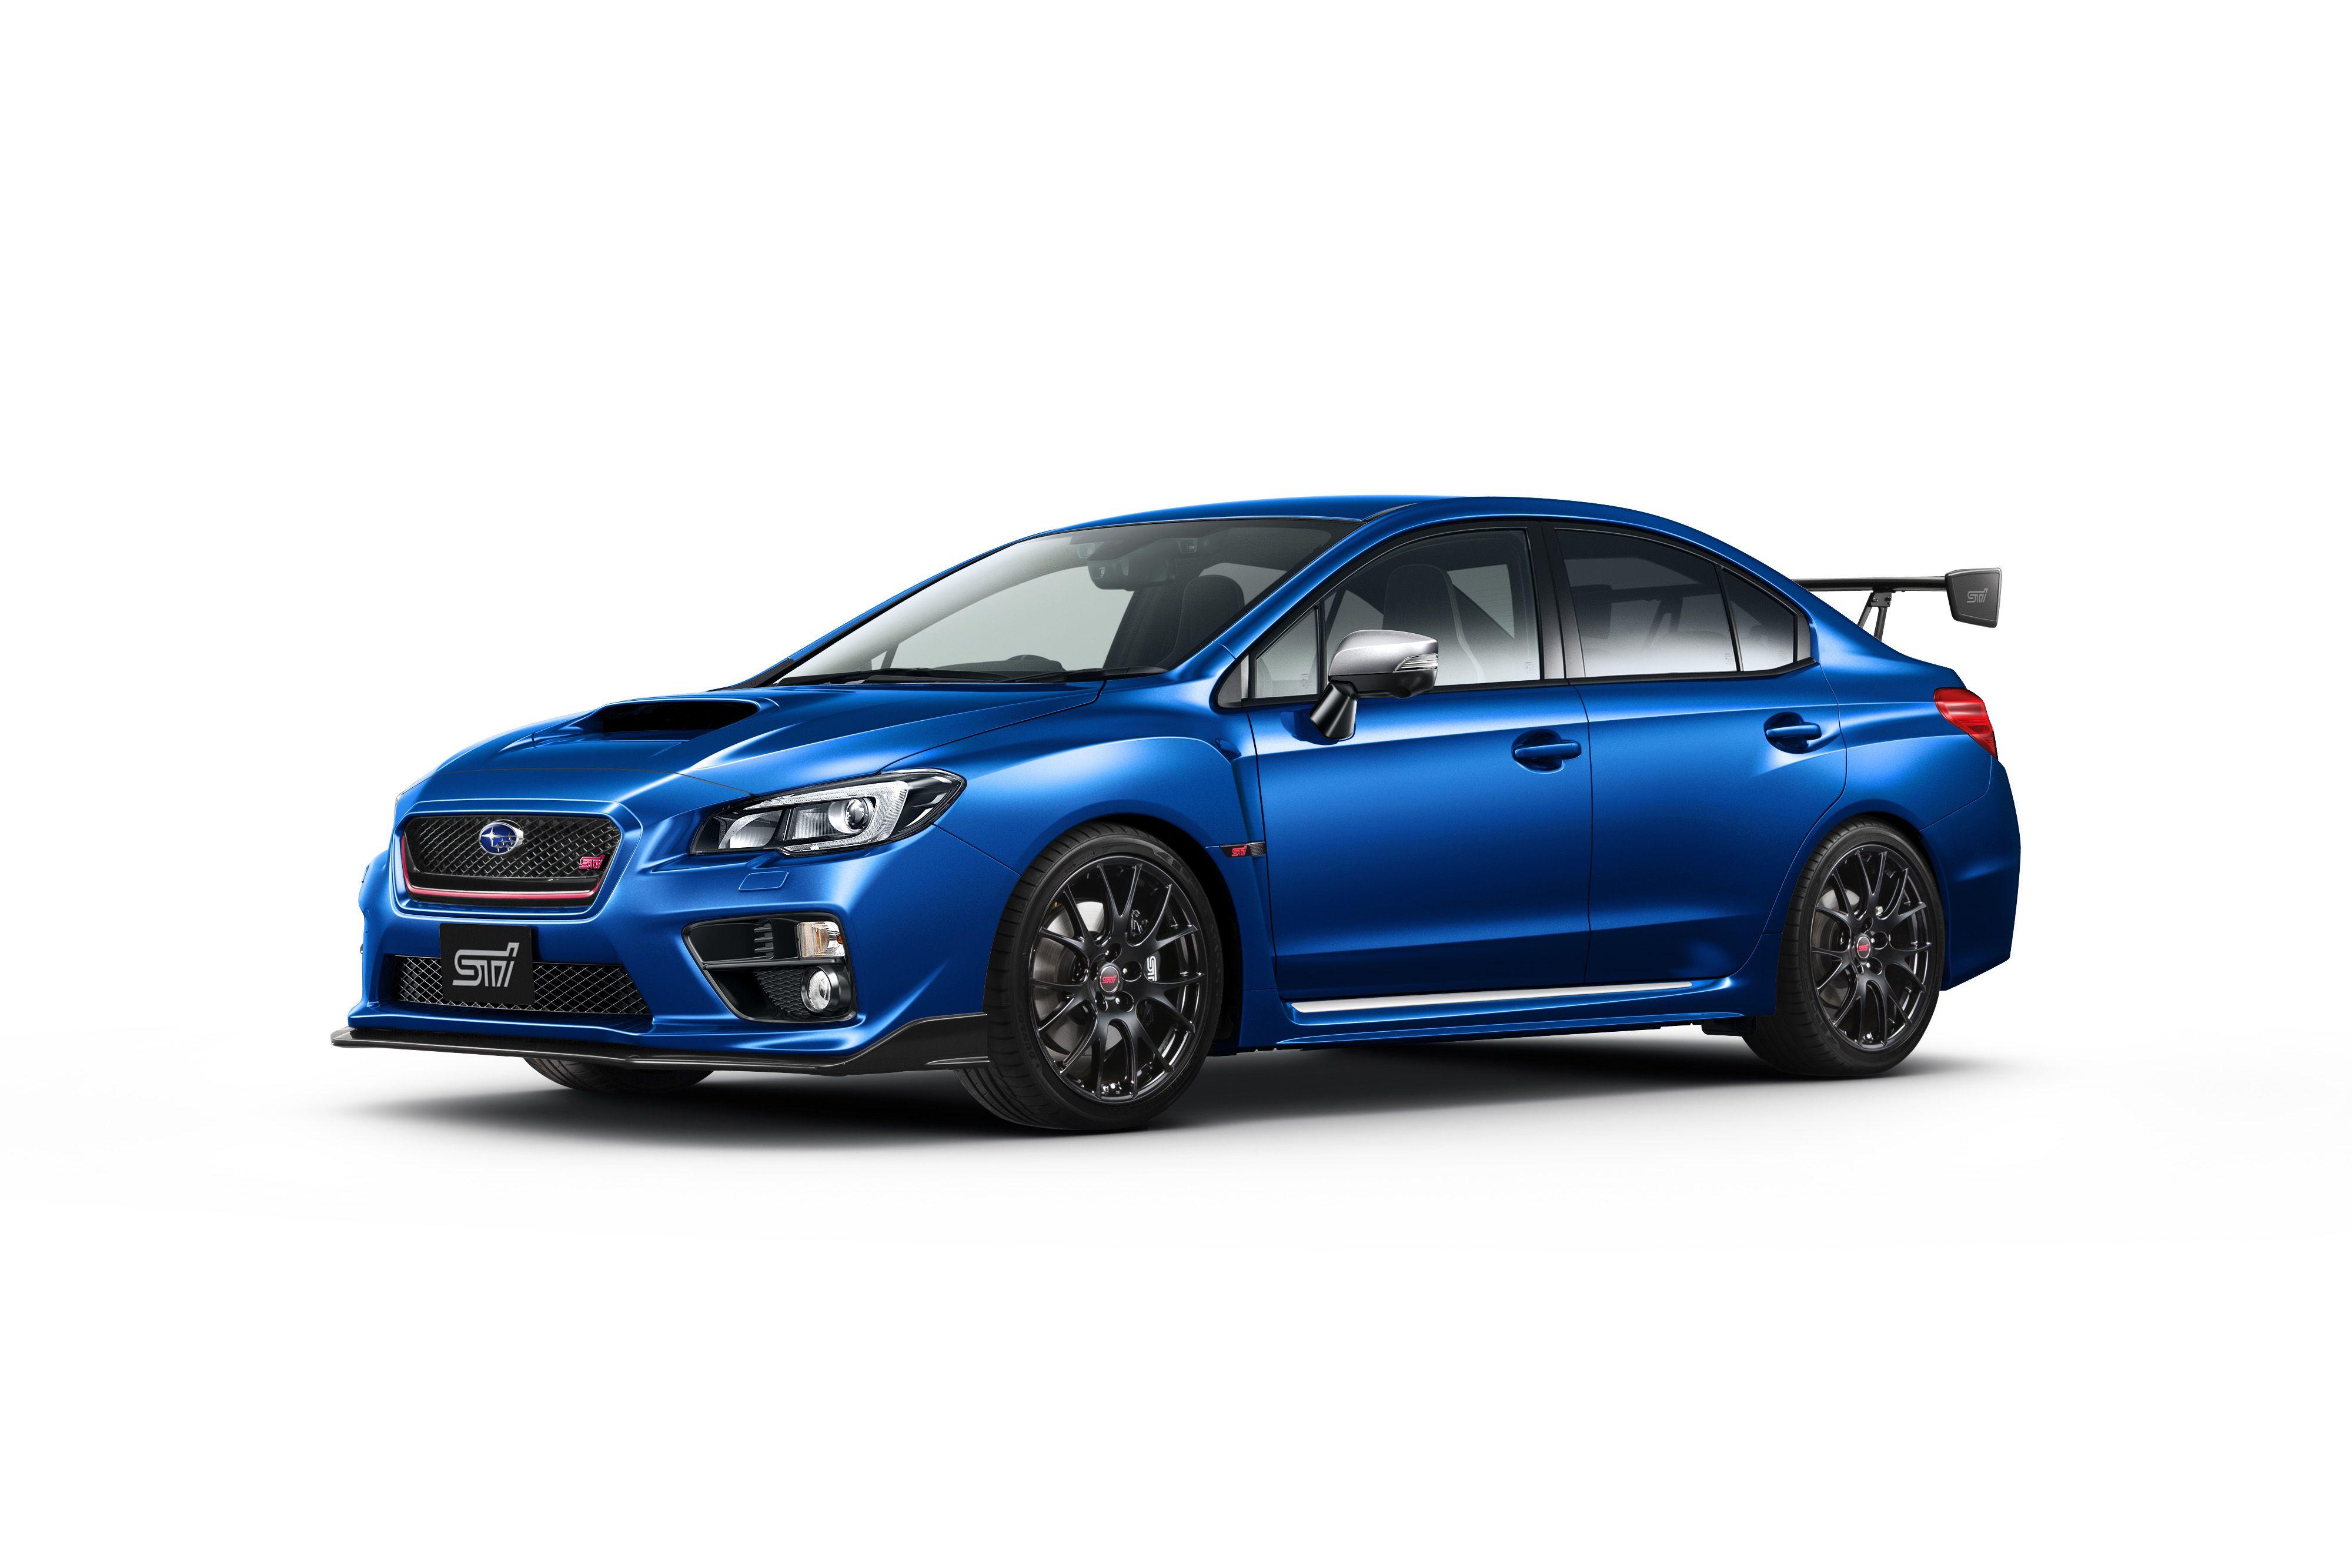 Subaru wrx s4 ts nbr challenge package 2016 17